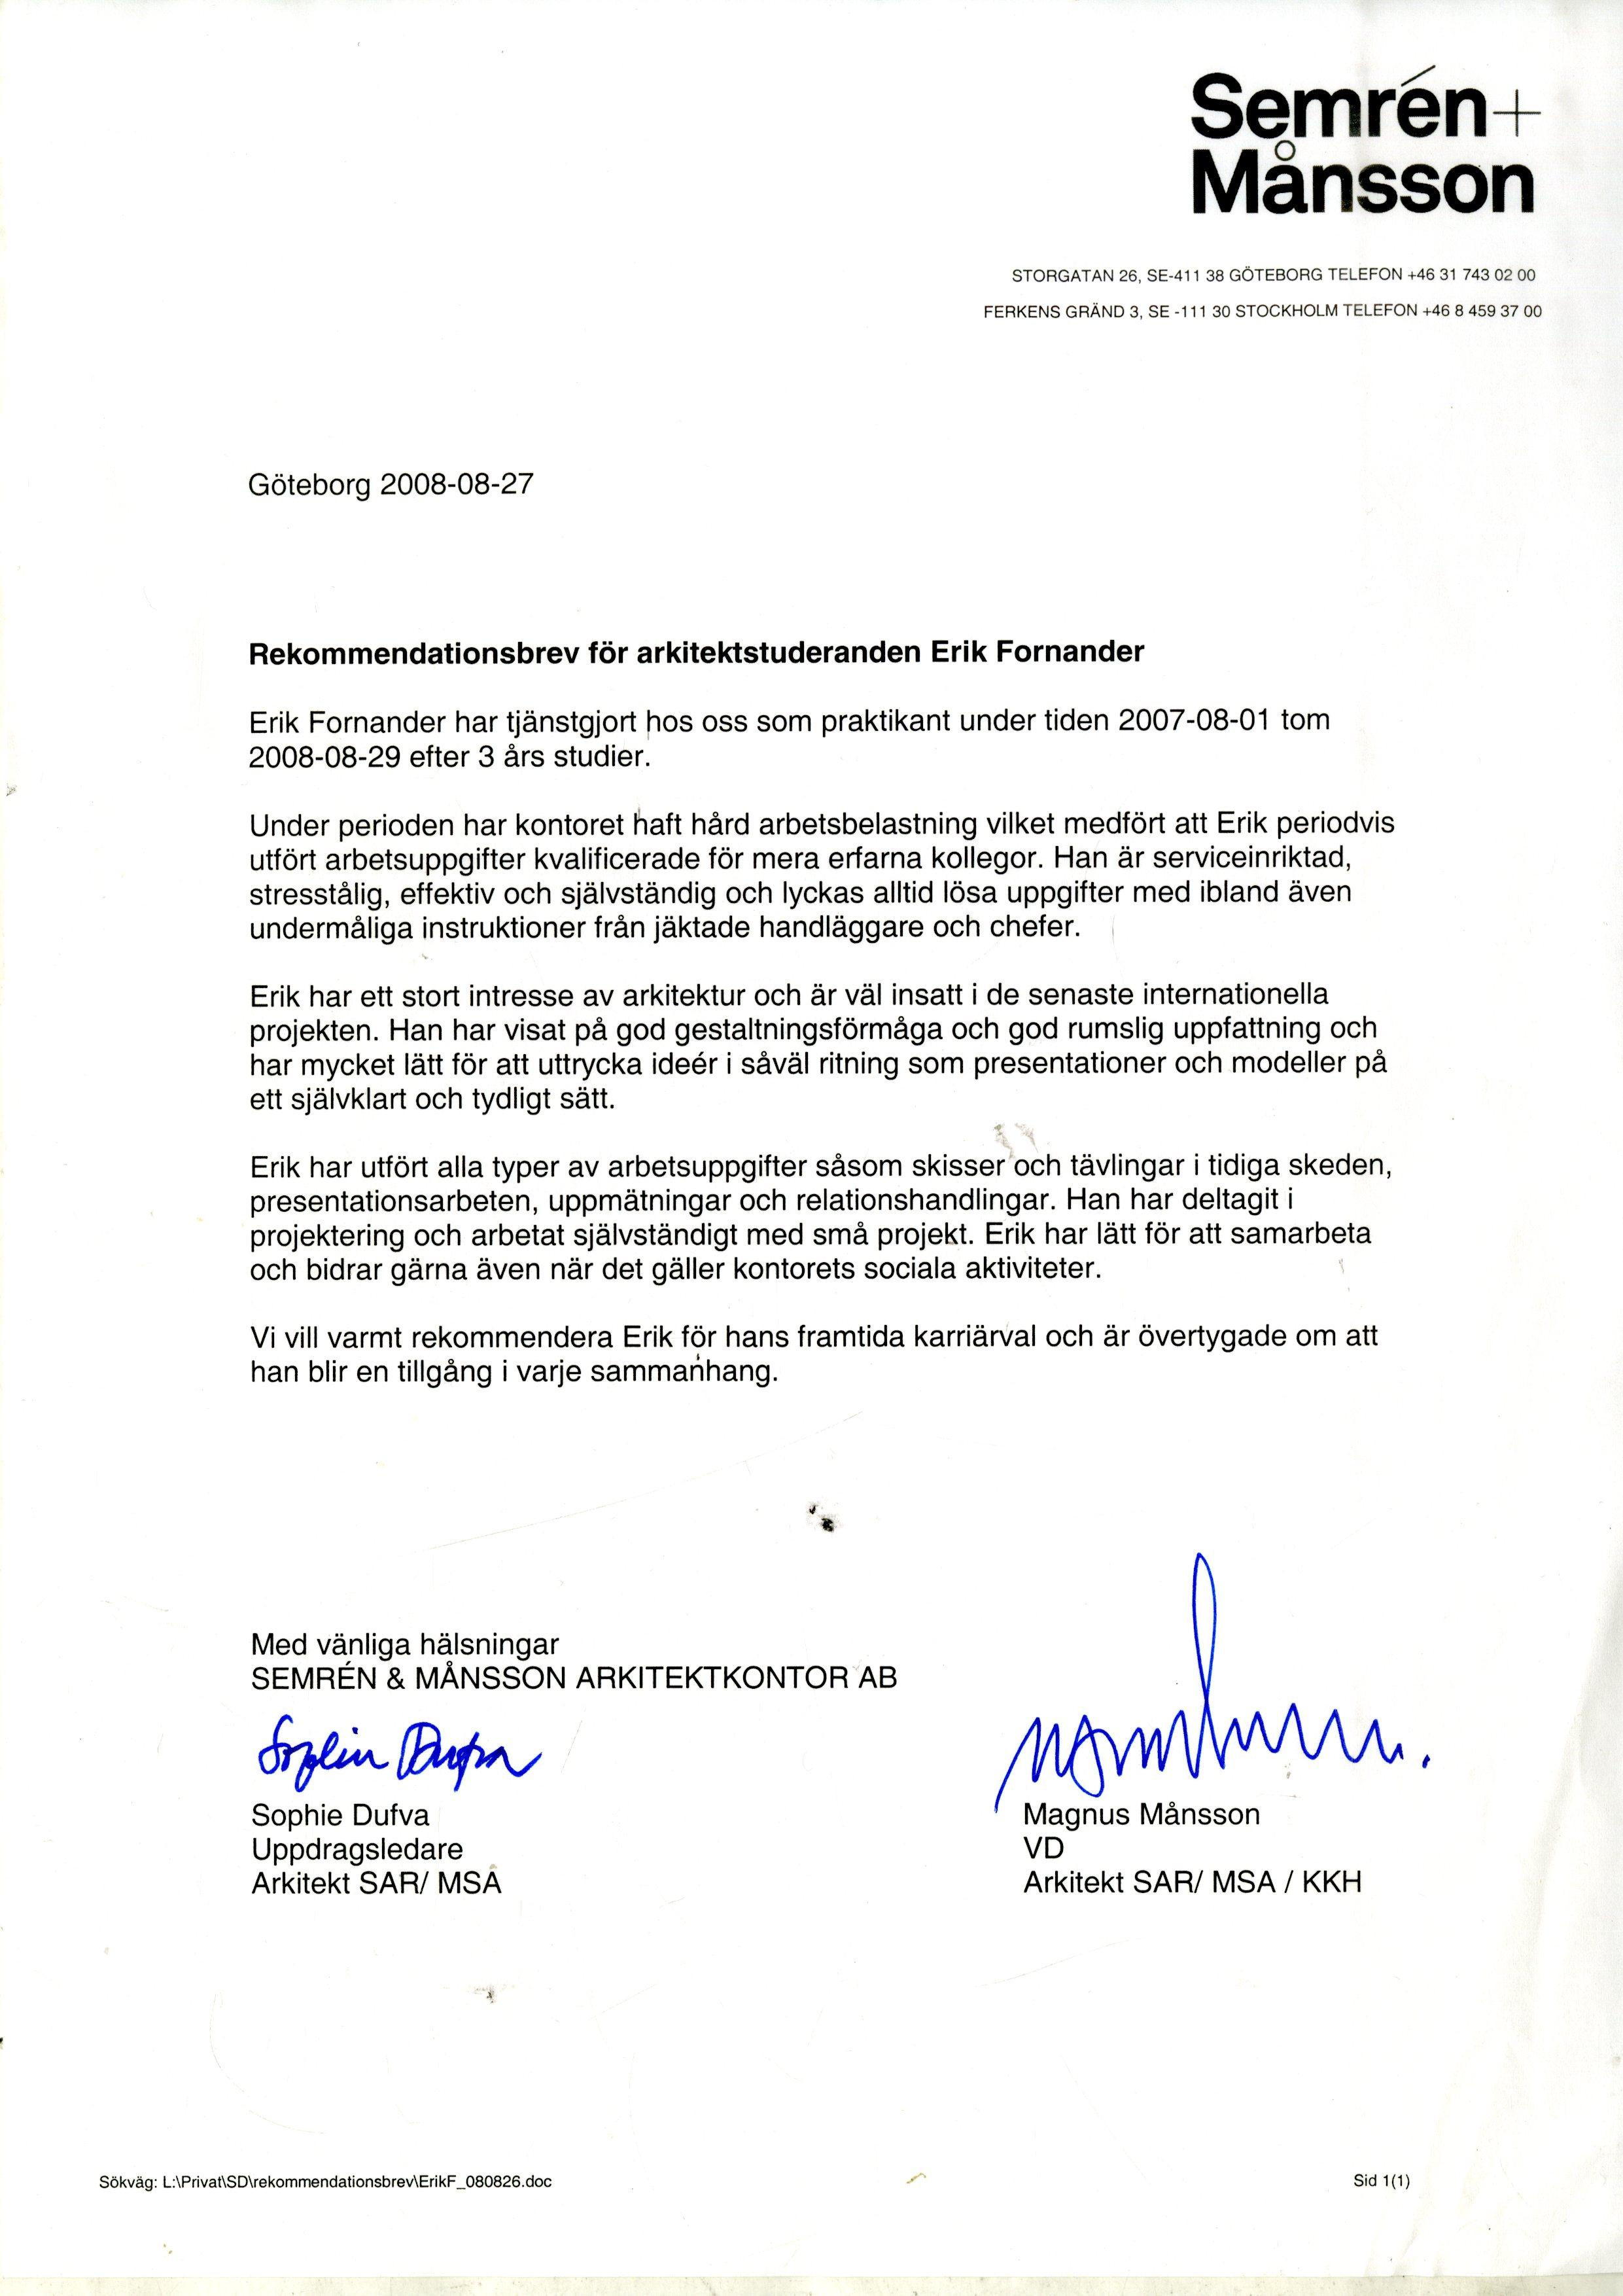 Internship Letter Of Recommendation Livecareer Recommendation Letter Erikfornander